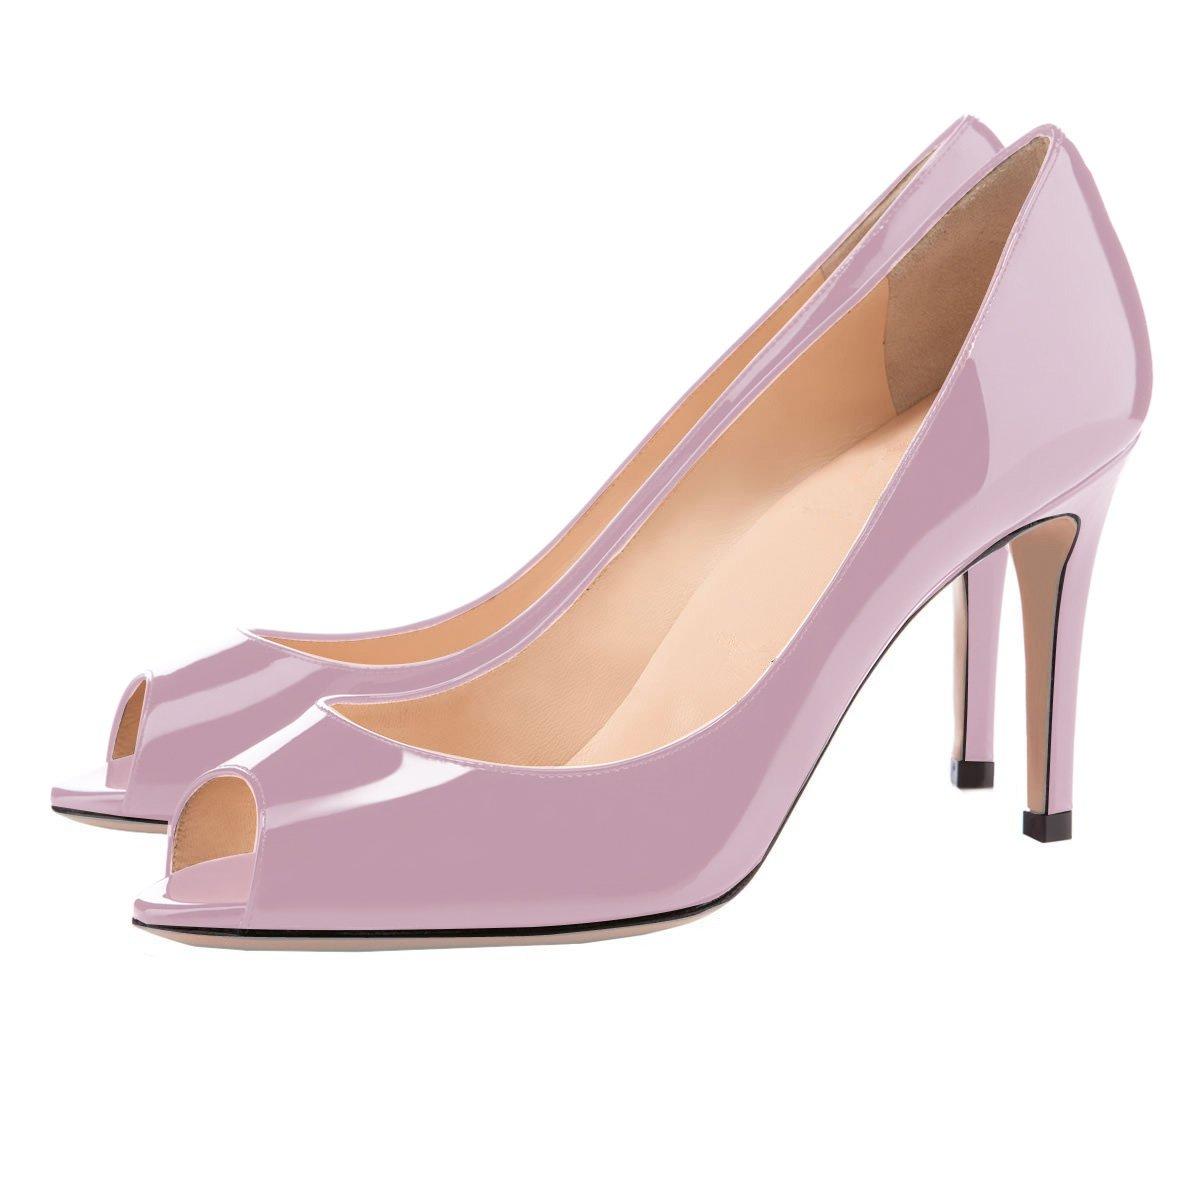 Eldof Women Peep Toe Pumps Mid-Heel Pumps Formal Wedding Bridal Classic Heel Open Toe Stiletto B07F1QNDZ9 7 B(M) US|Light Purple